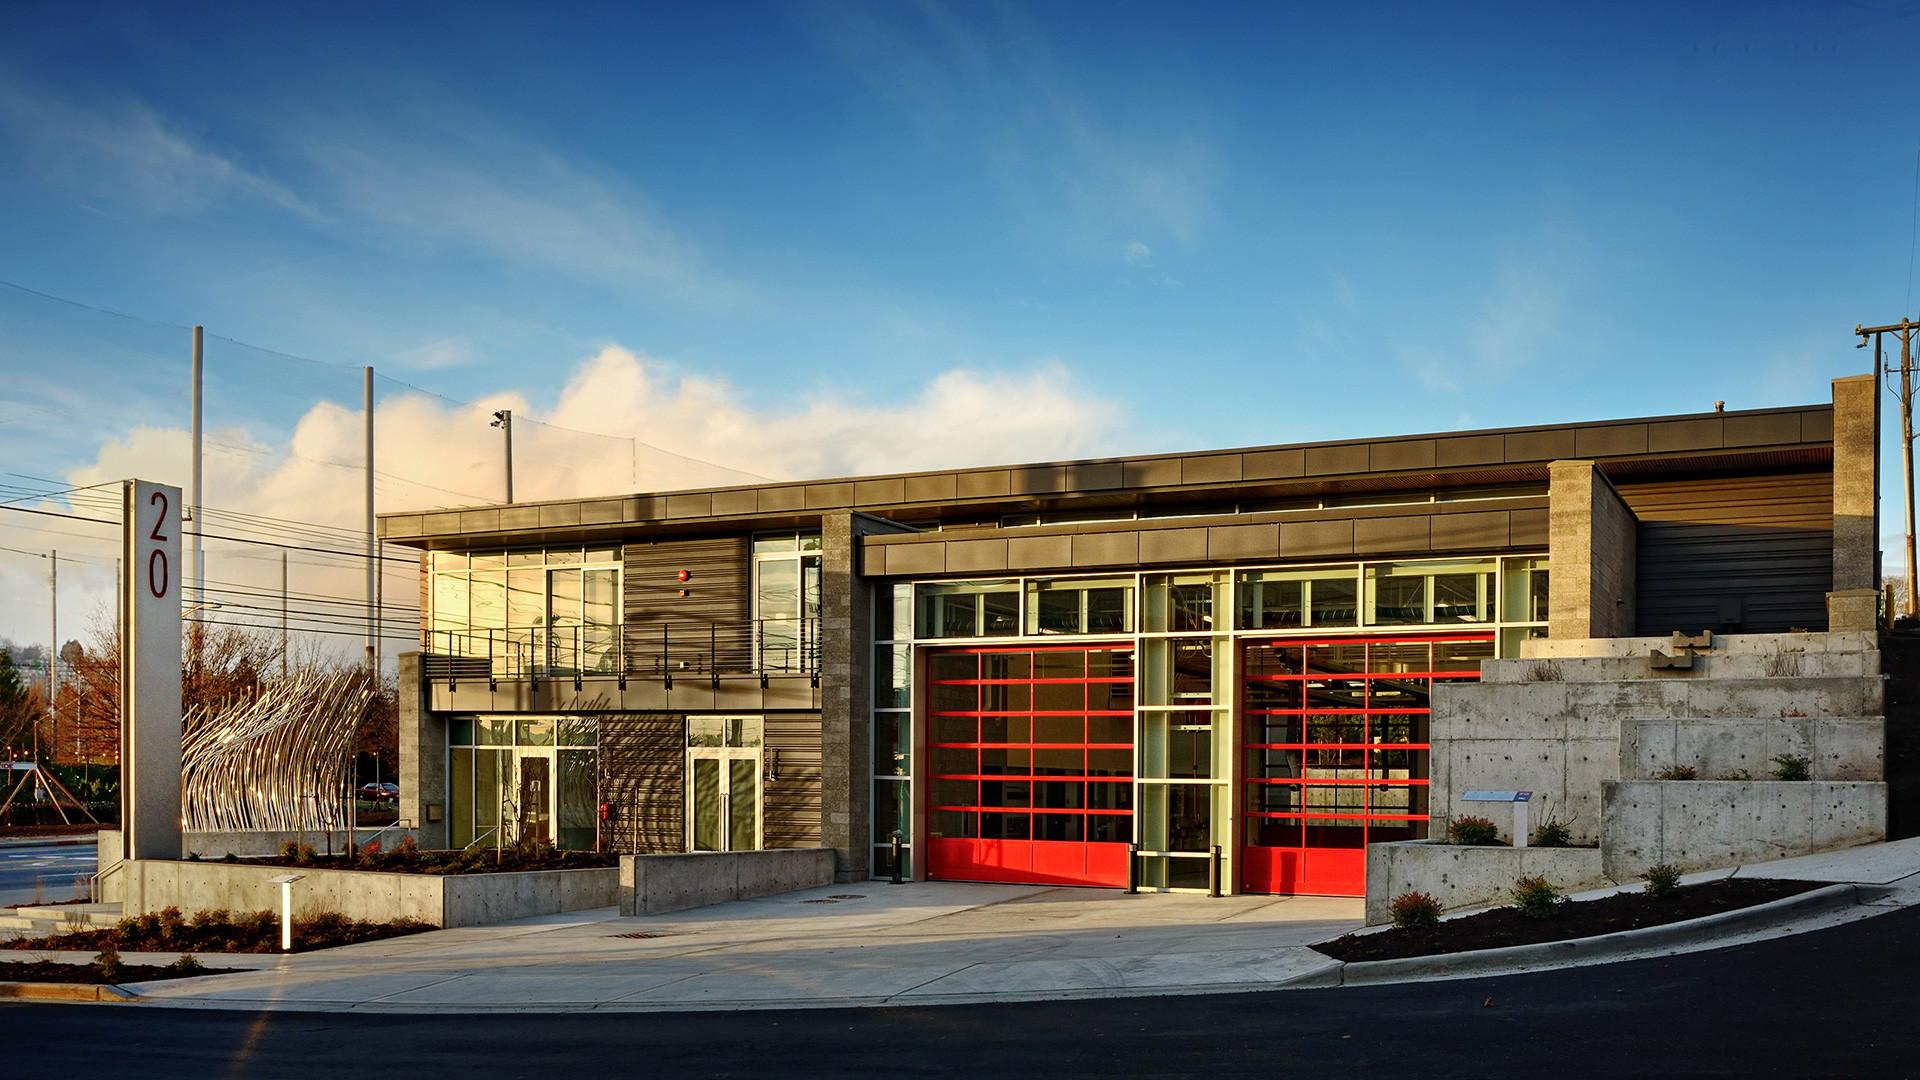 Interbay Fire Station 20 | Swenson Say Fagét